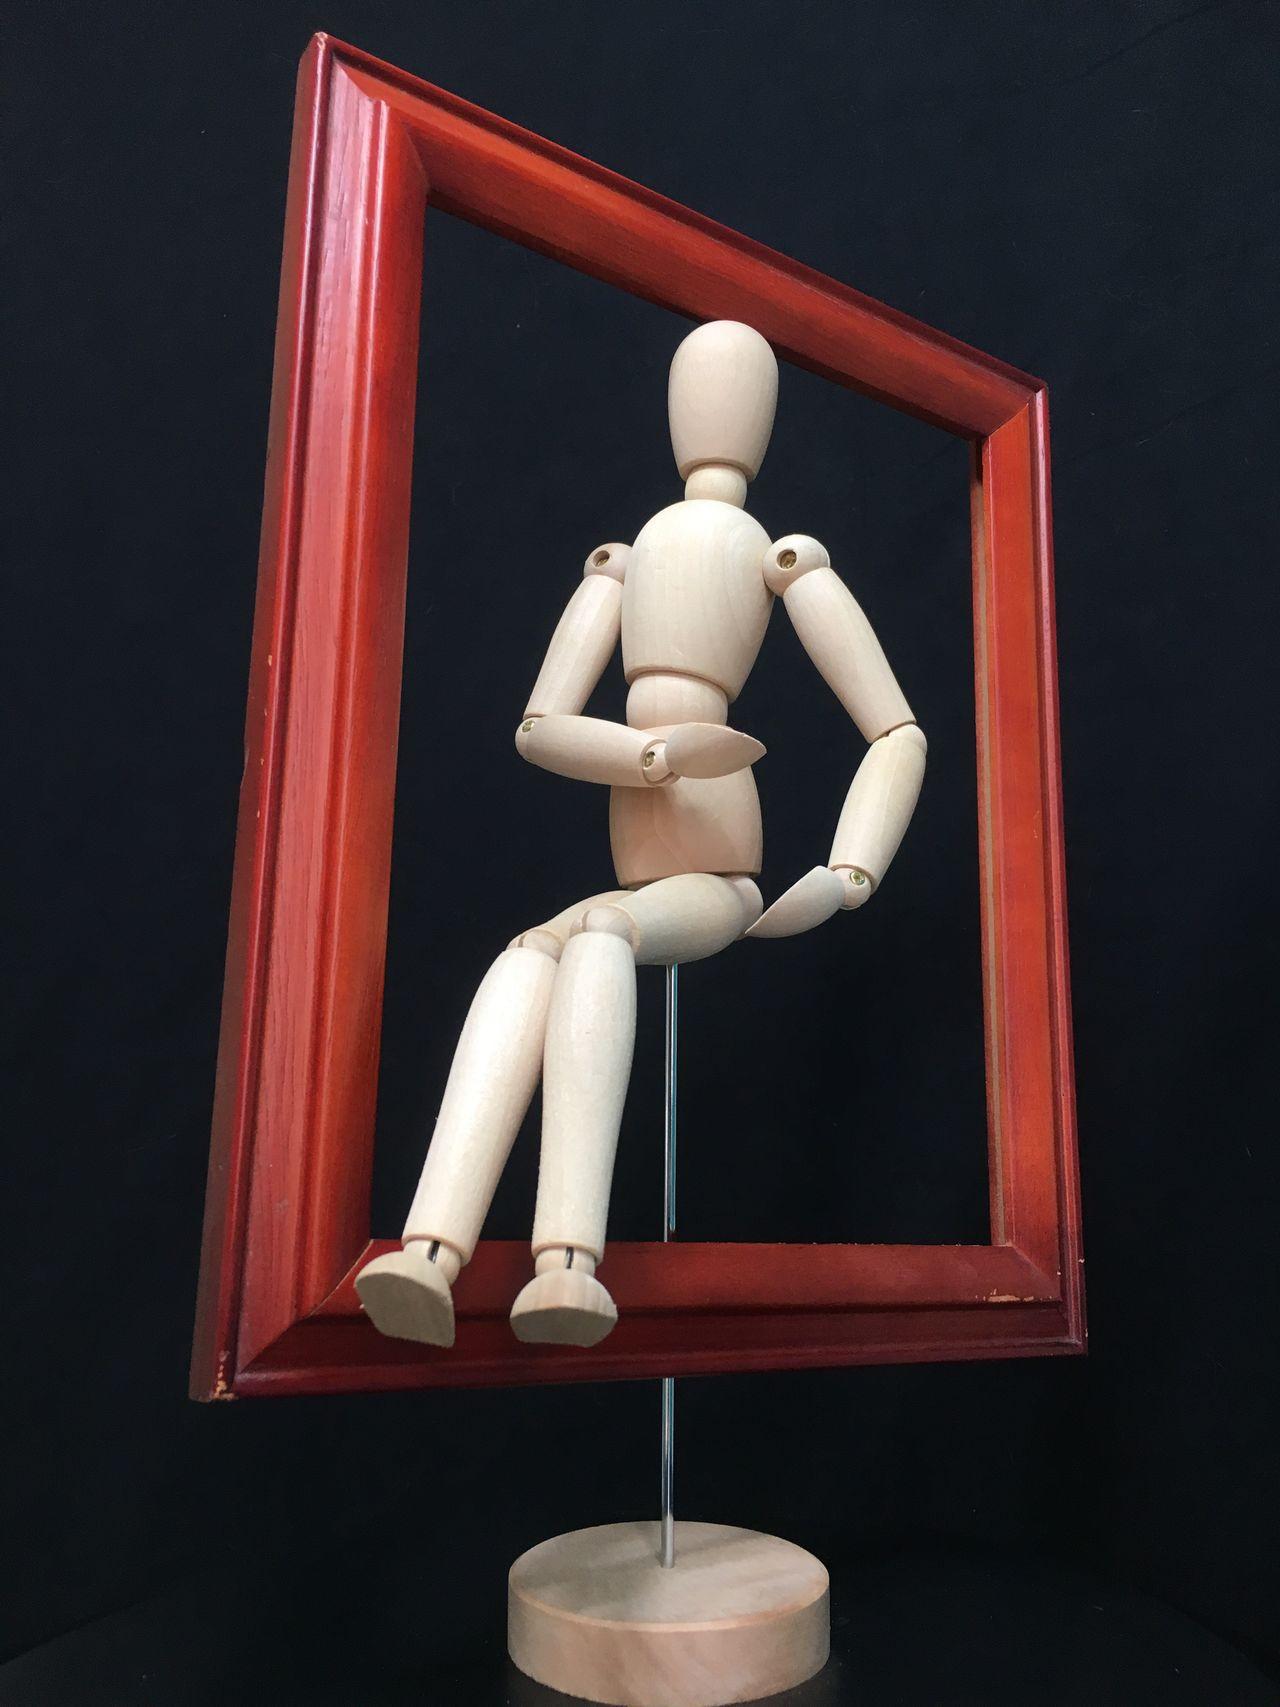 Pose Frame Human Representation Wood - Material Studio Shot Mannequin Still Life StillLifePhotography posed